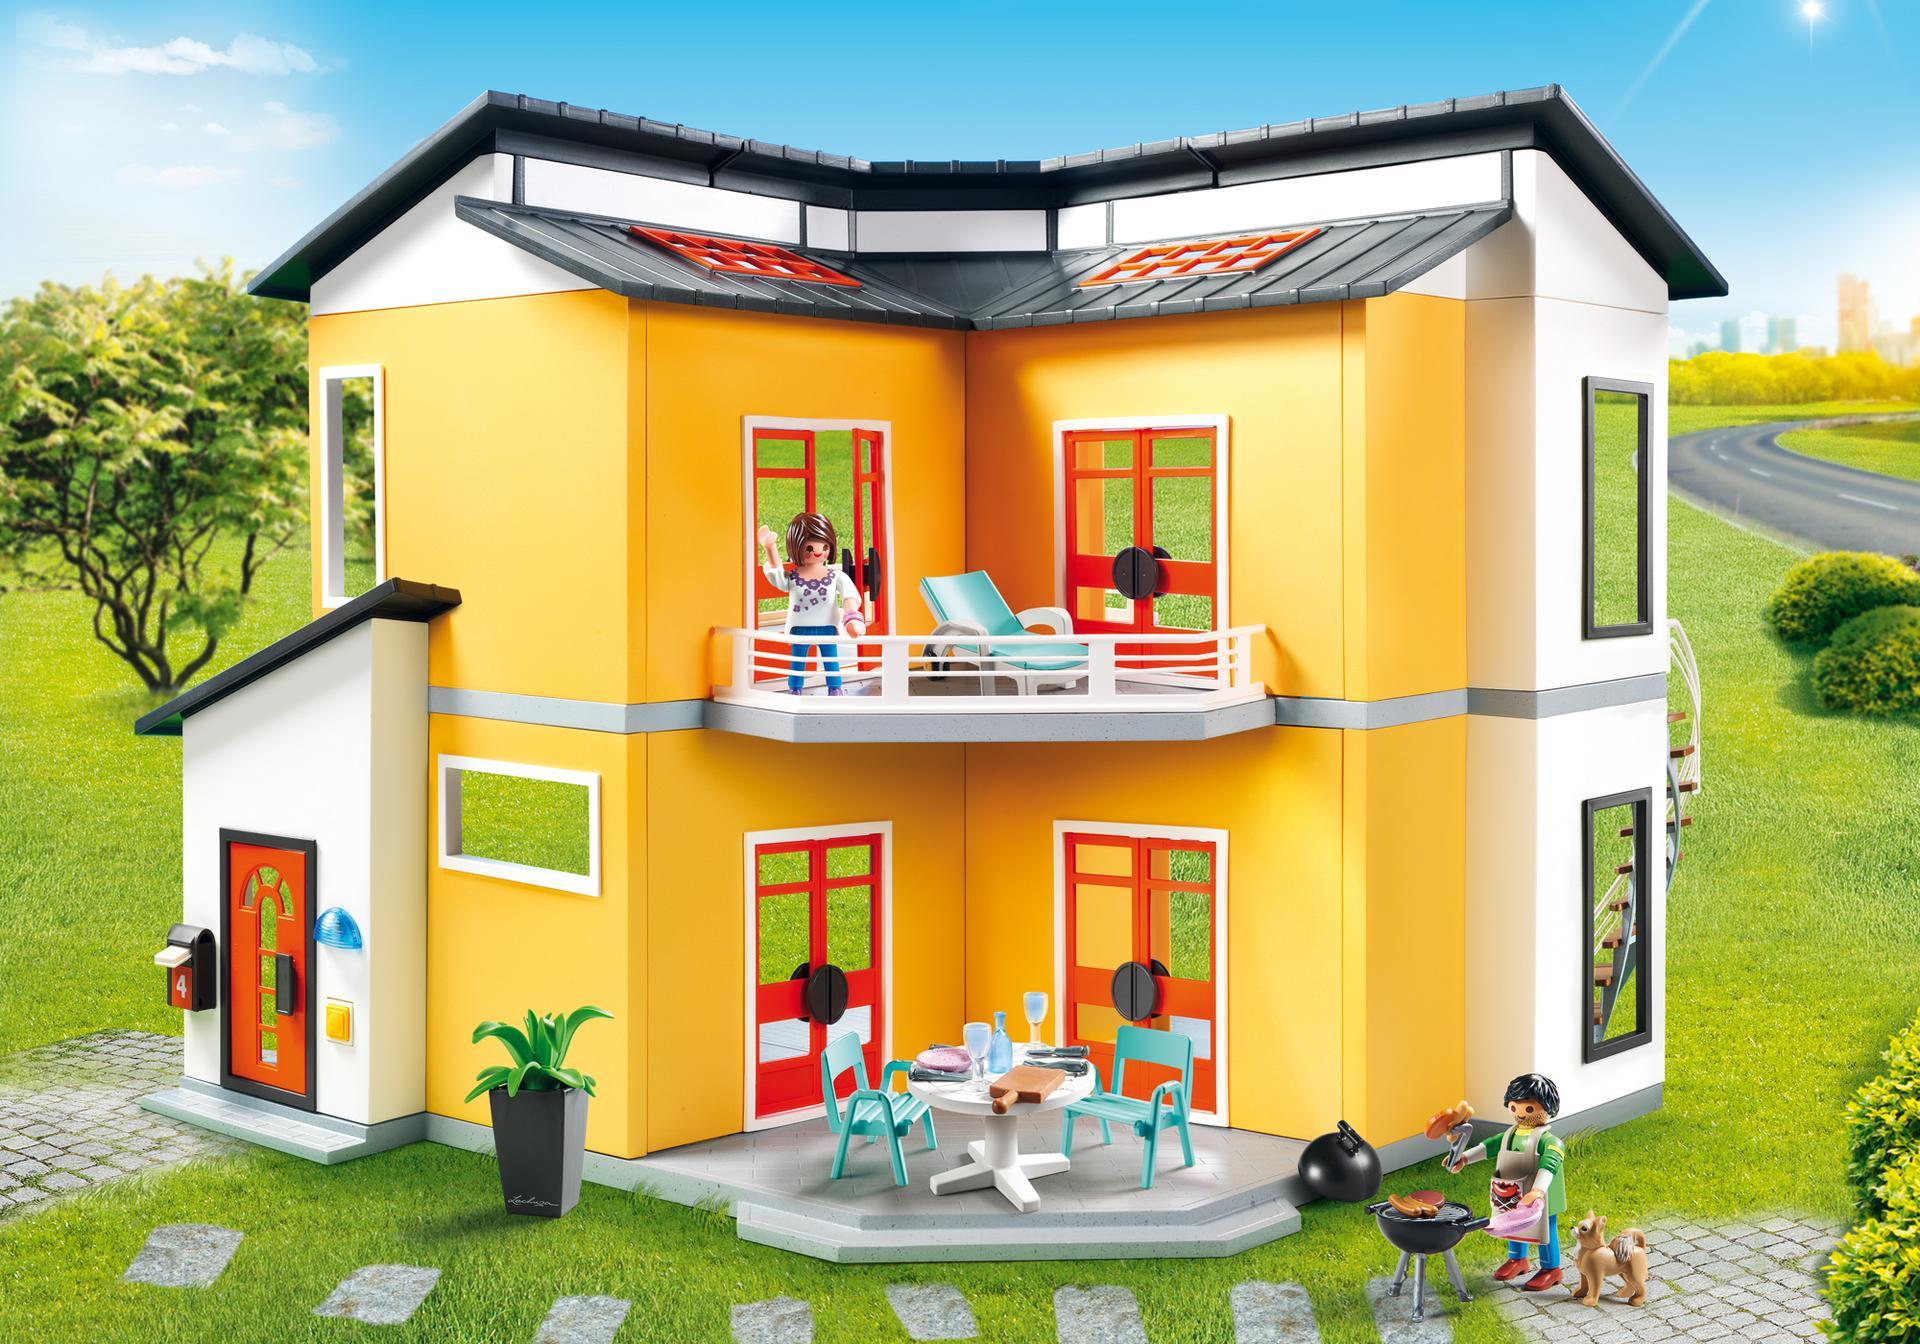 modern house 9266 playmobil. Black Bedroom Furniture Sets. Home Design Ideas